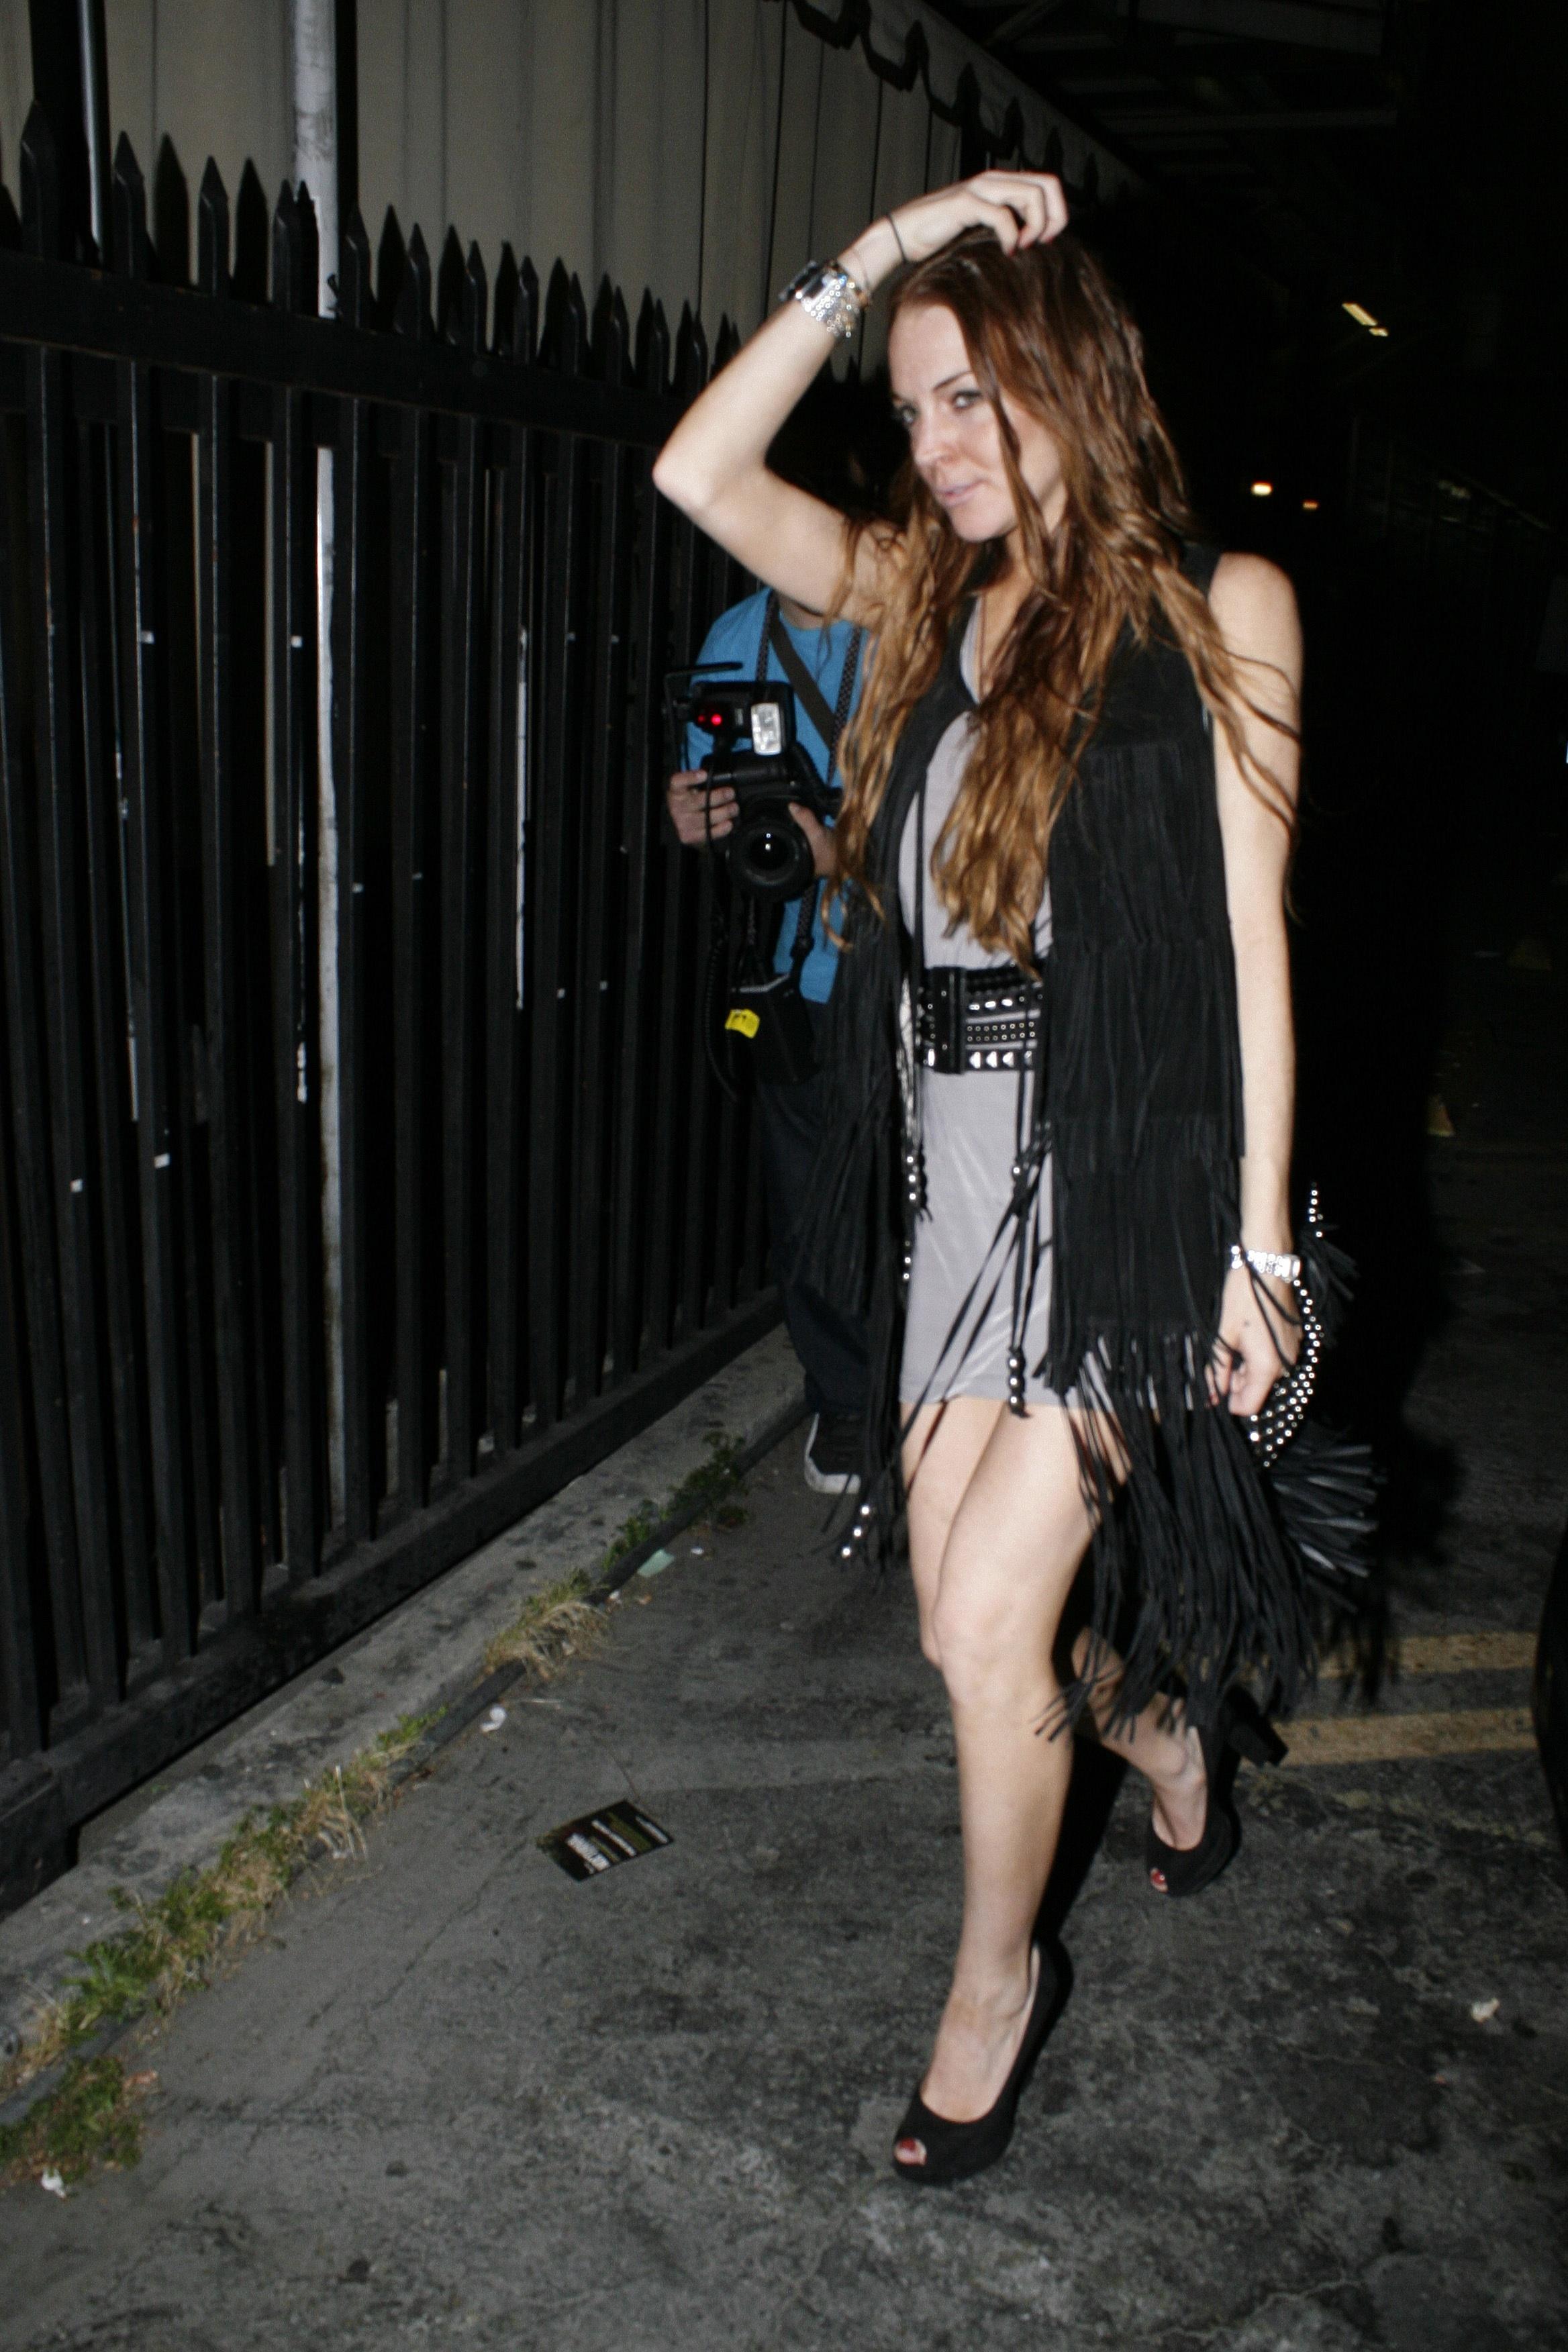 SPL92921_002 Lindsay Lohan